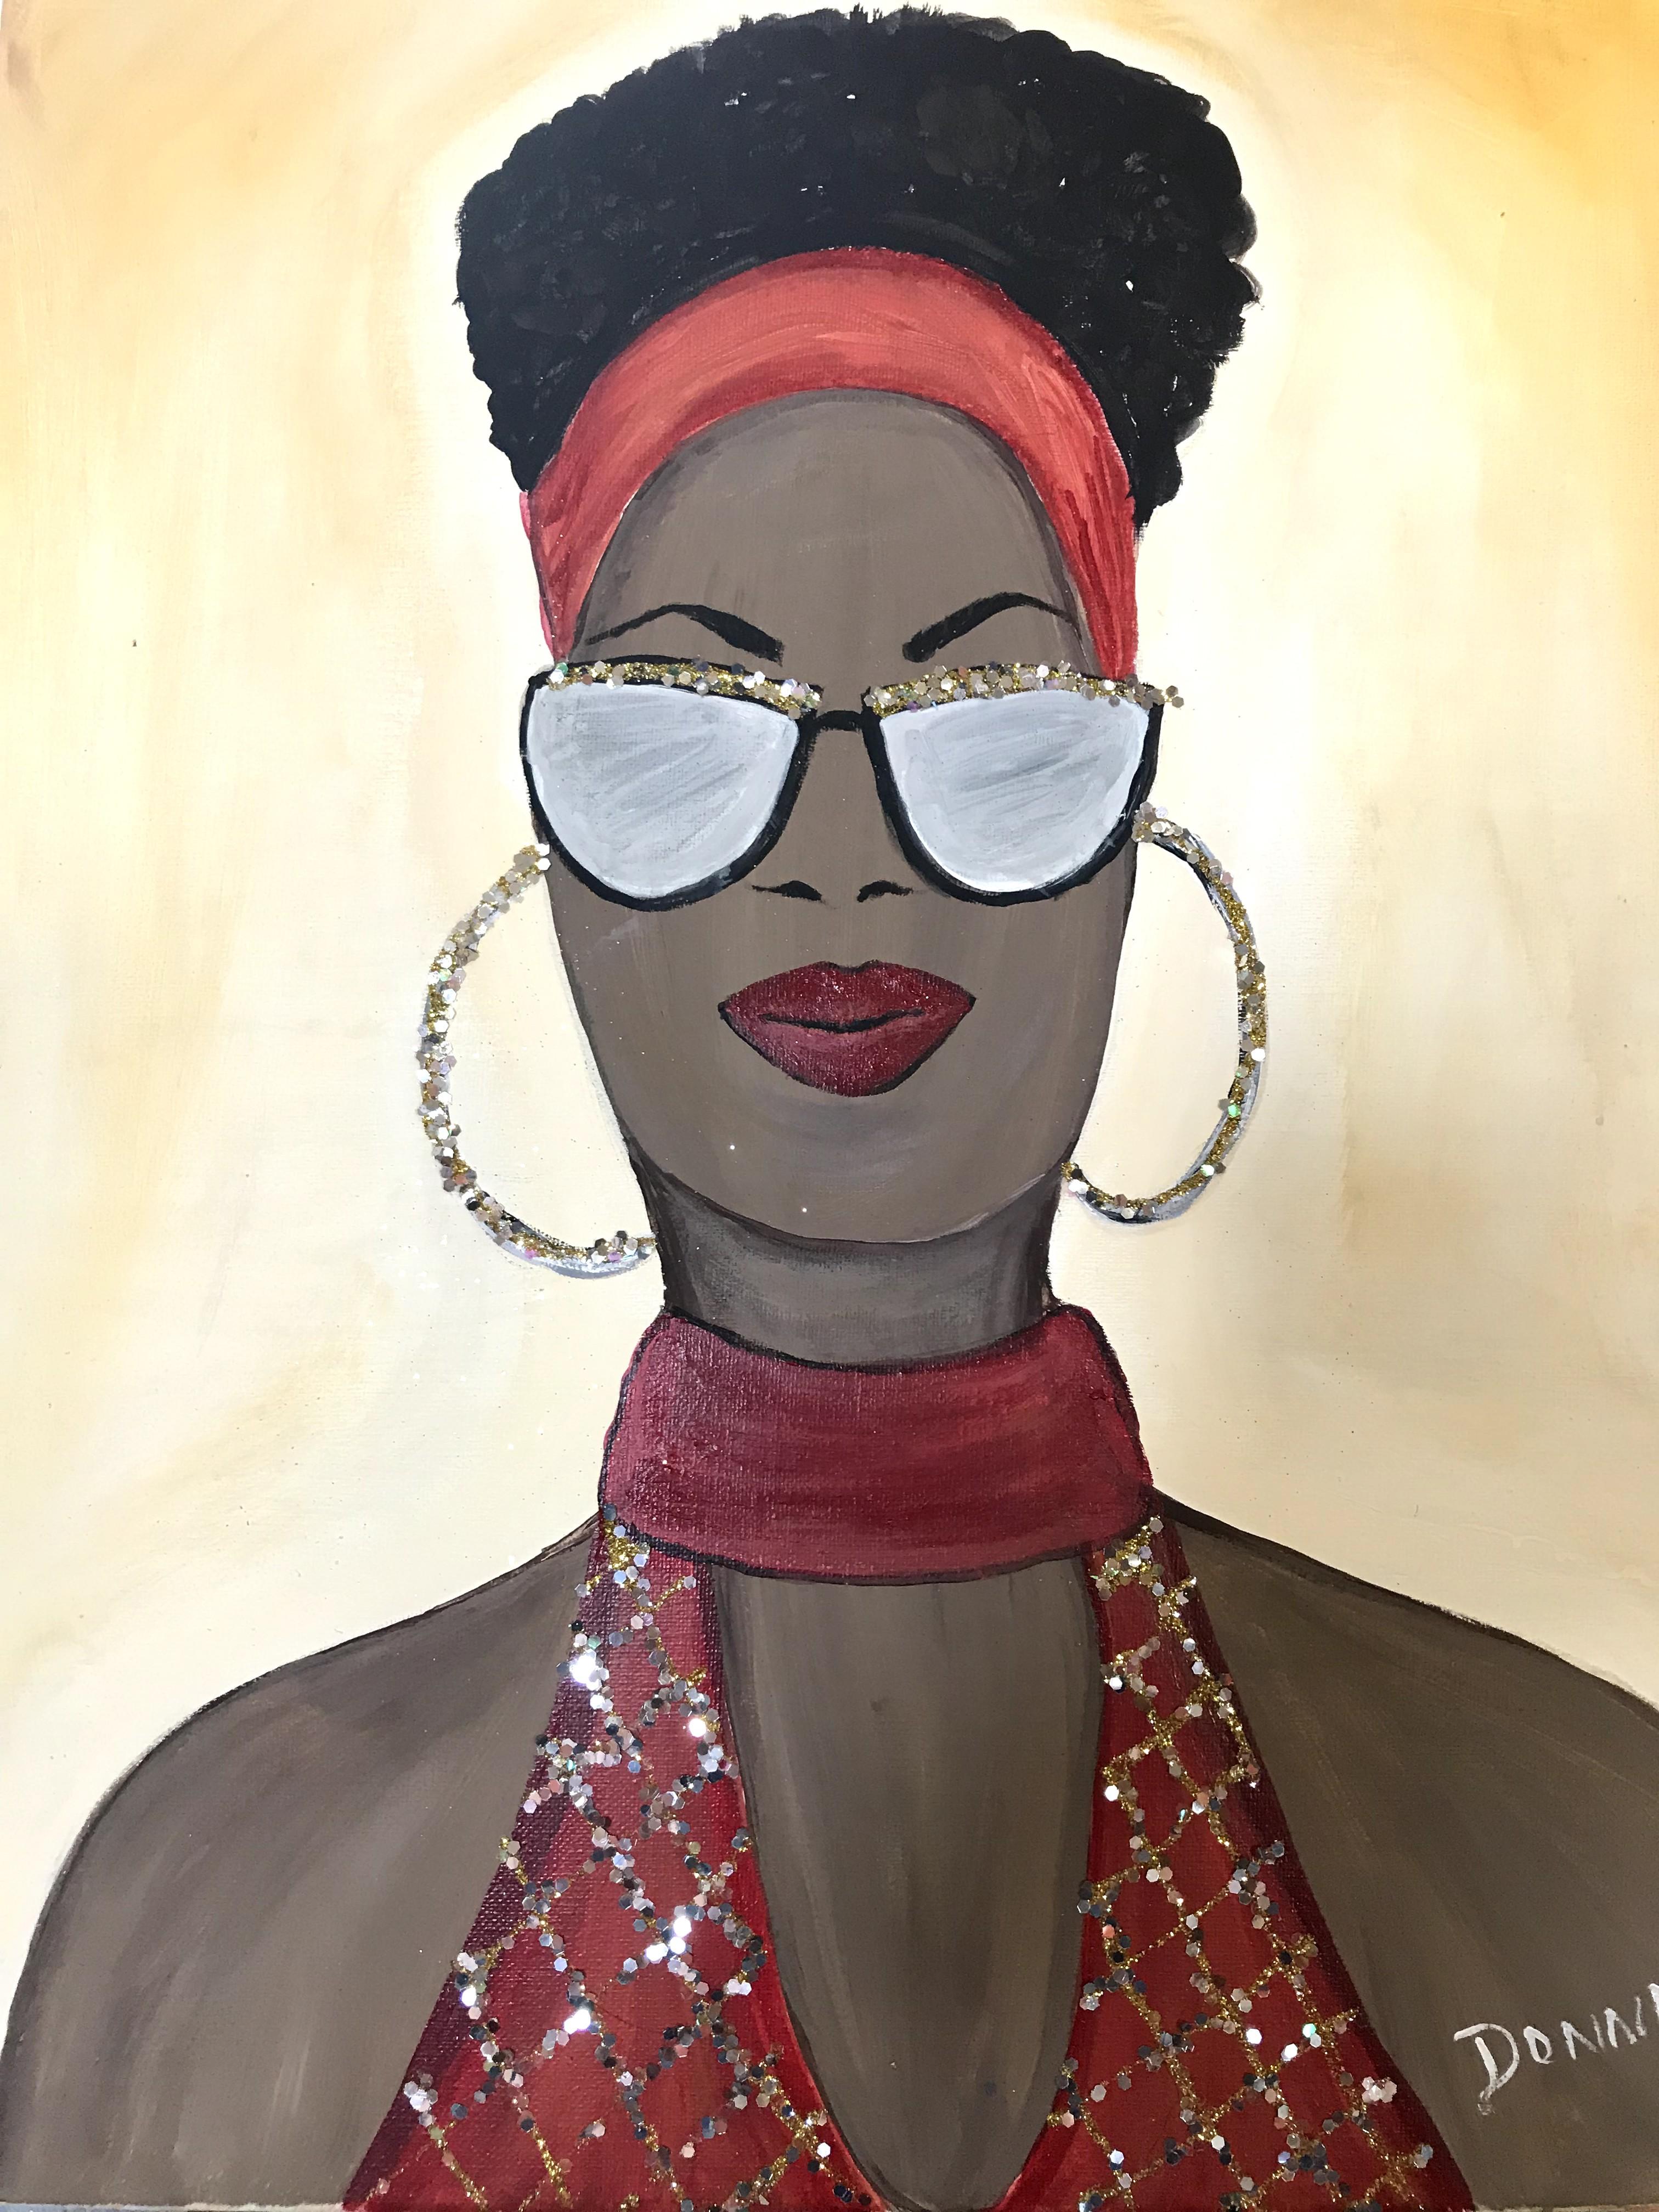 Sunglasses #13